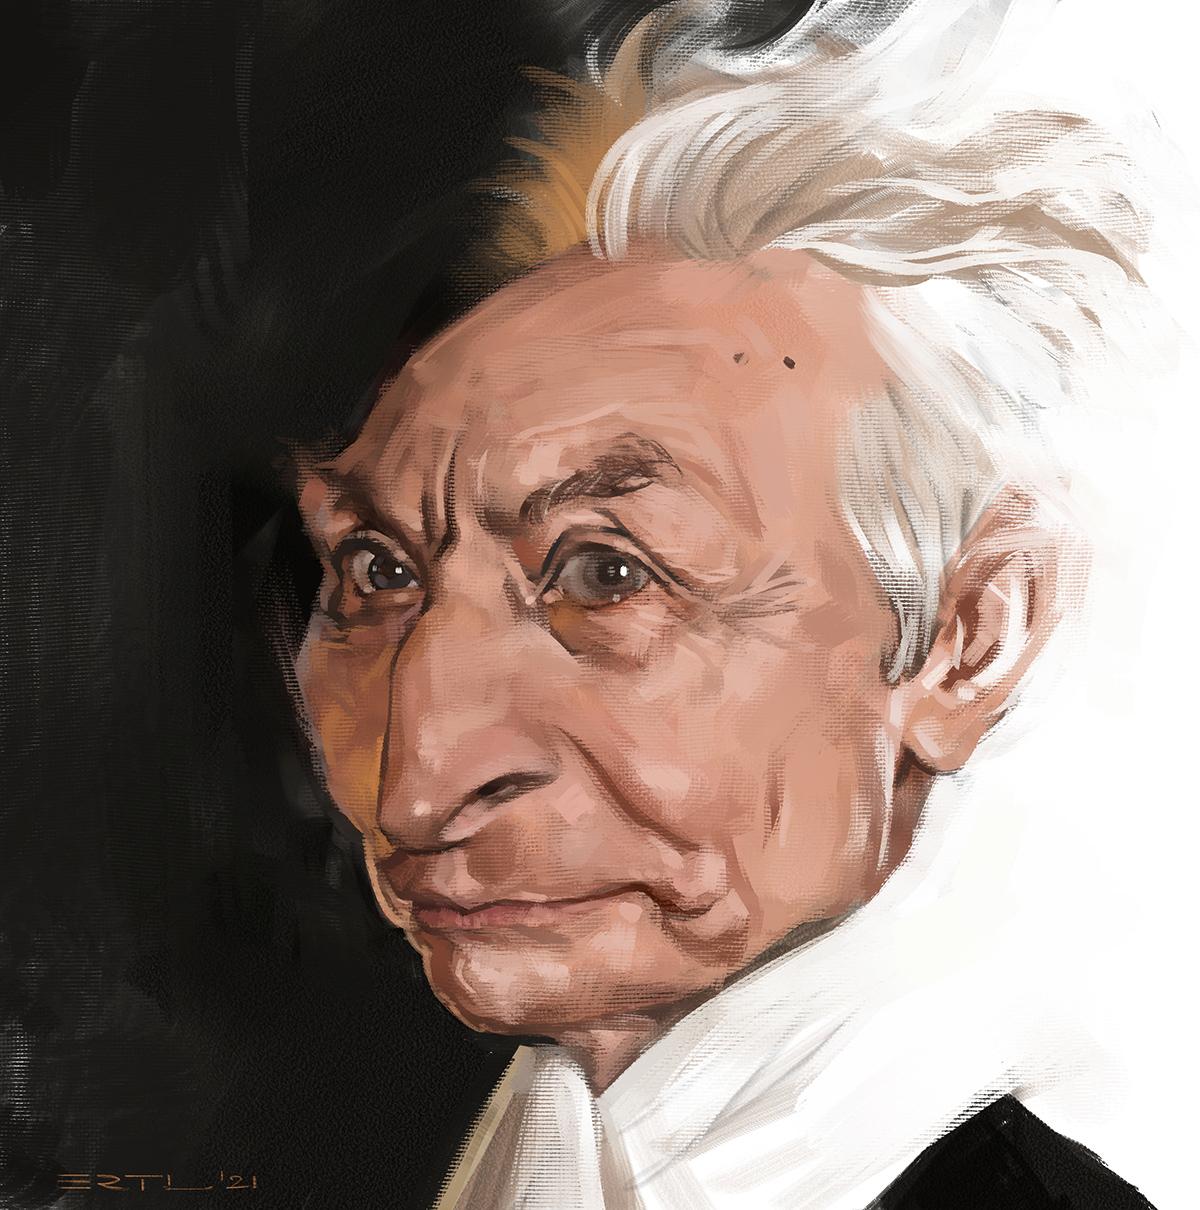 Charlie Watts caricature portrait Bernd Ertl